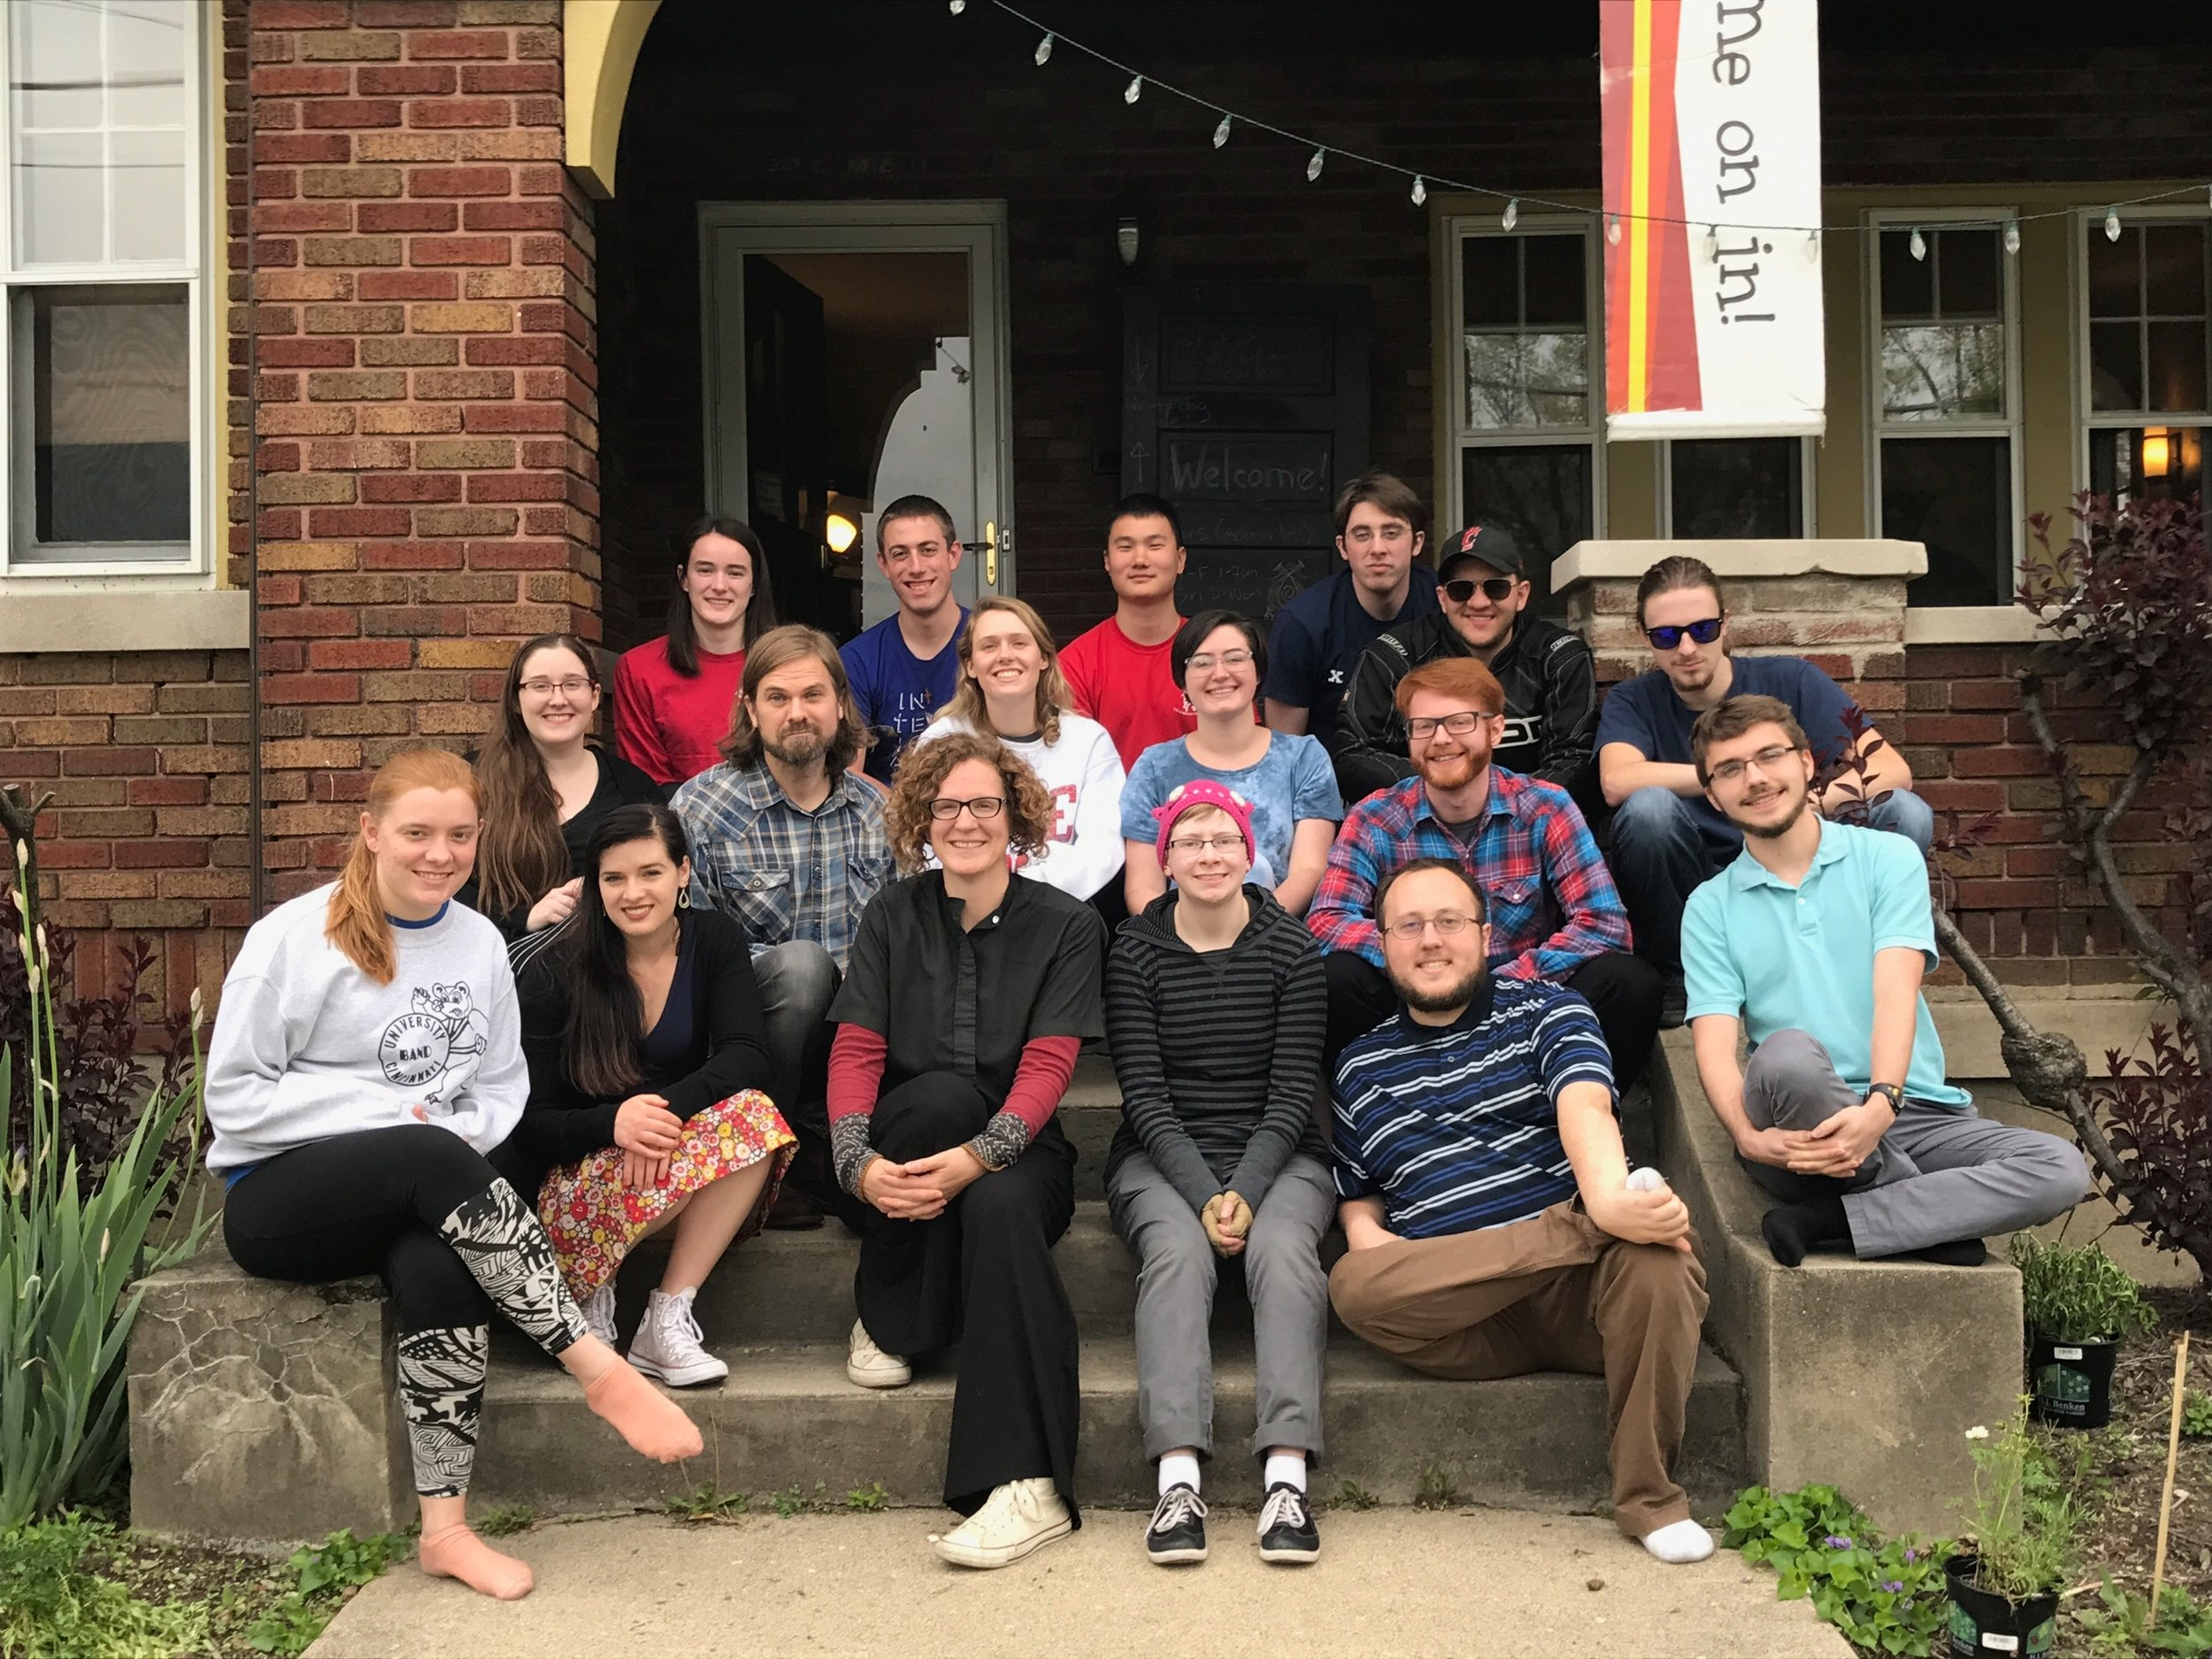 Graduation and godspeed NOSH 2017.